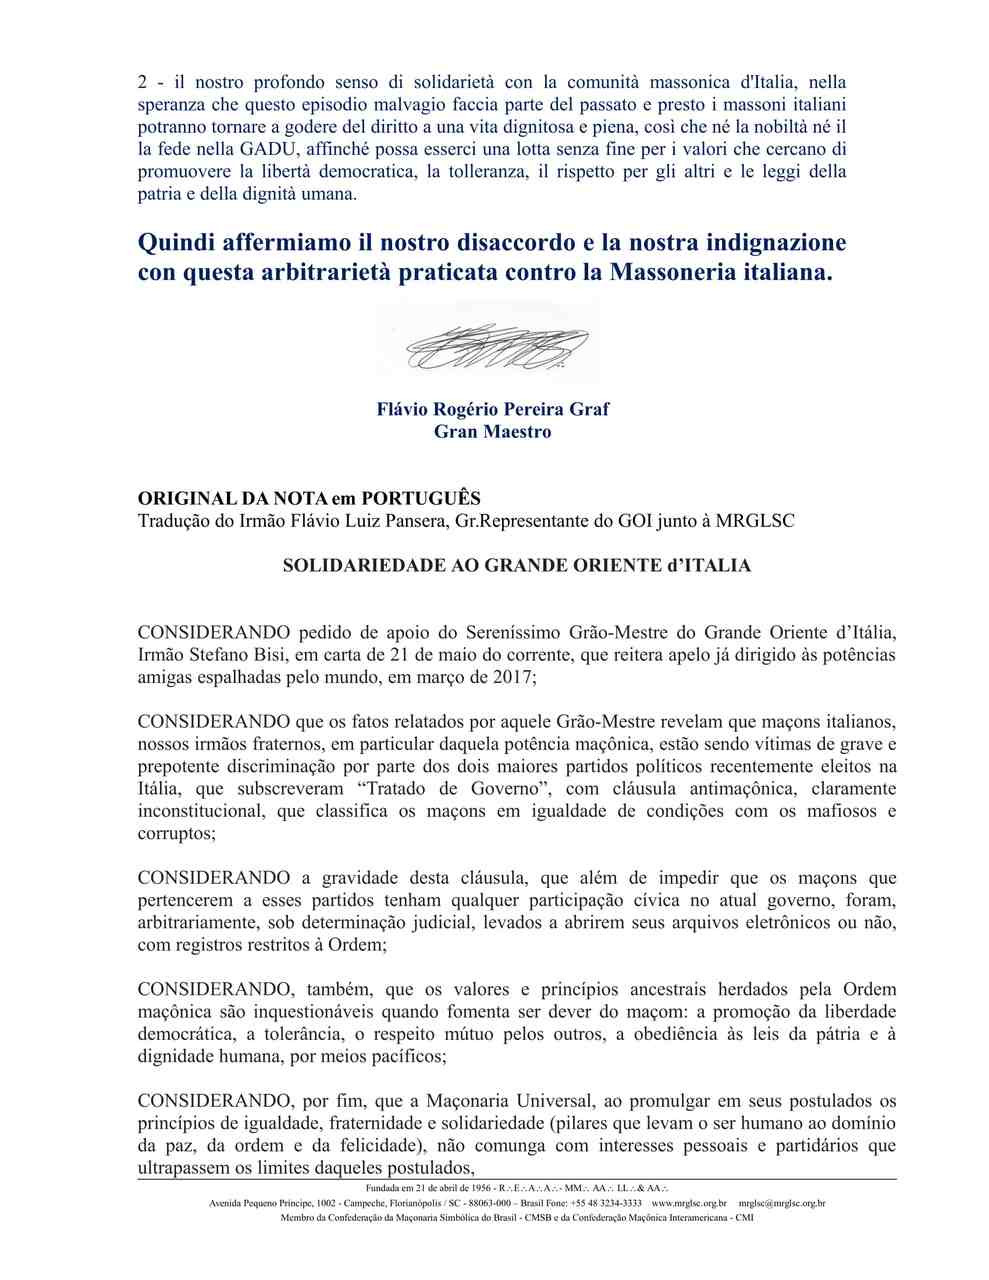 Solidarieta al Grande Oriente d'Itália | Grande Loja de Santa Catarina, BRASIL